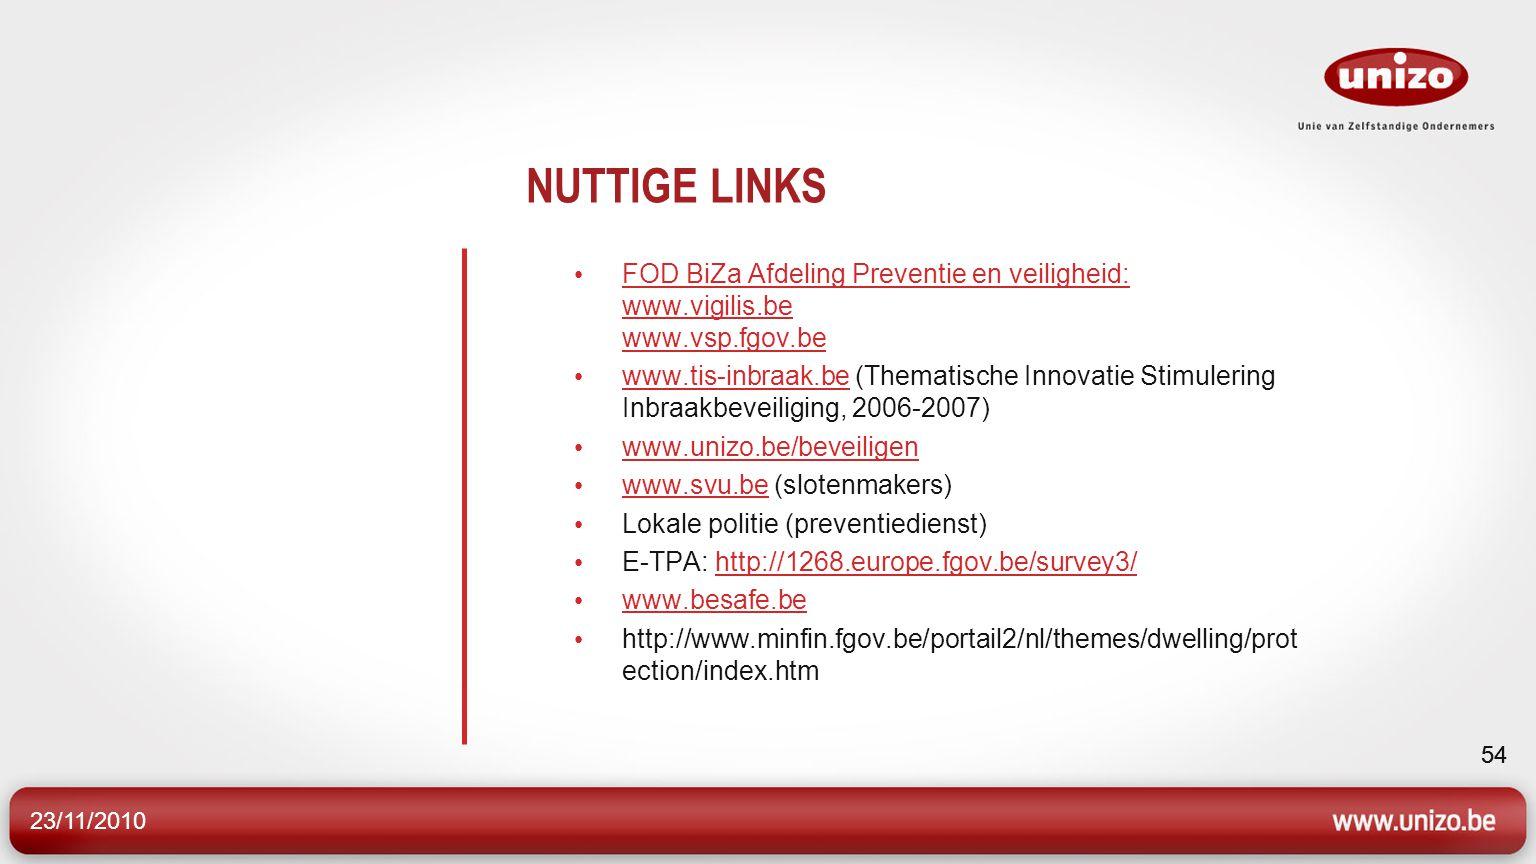 23/11/2010 54 NUTTIGE LINKS FOD BiZa Afdeling Preventie en veiligheid: www.vigilis.be www.vsp.fgov.be FOD BiZa Afdeling Preventie en veiligheid: www.v